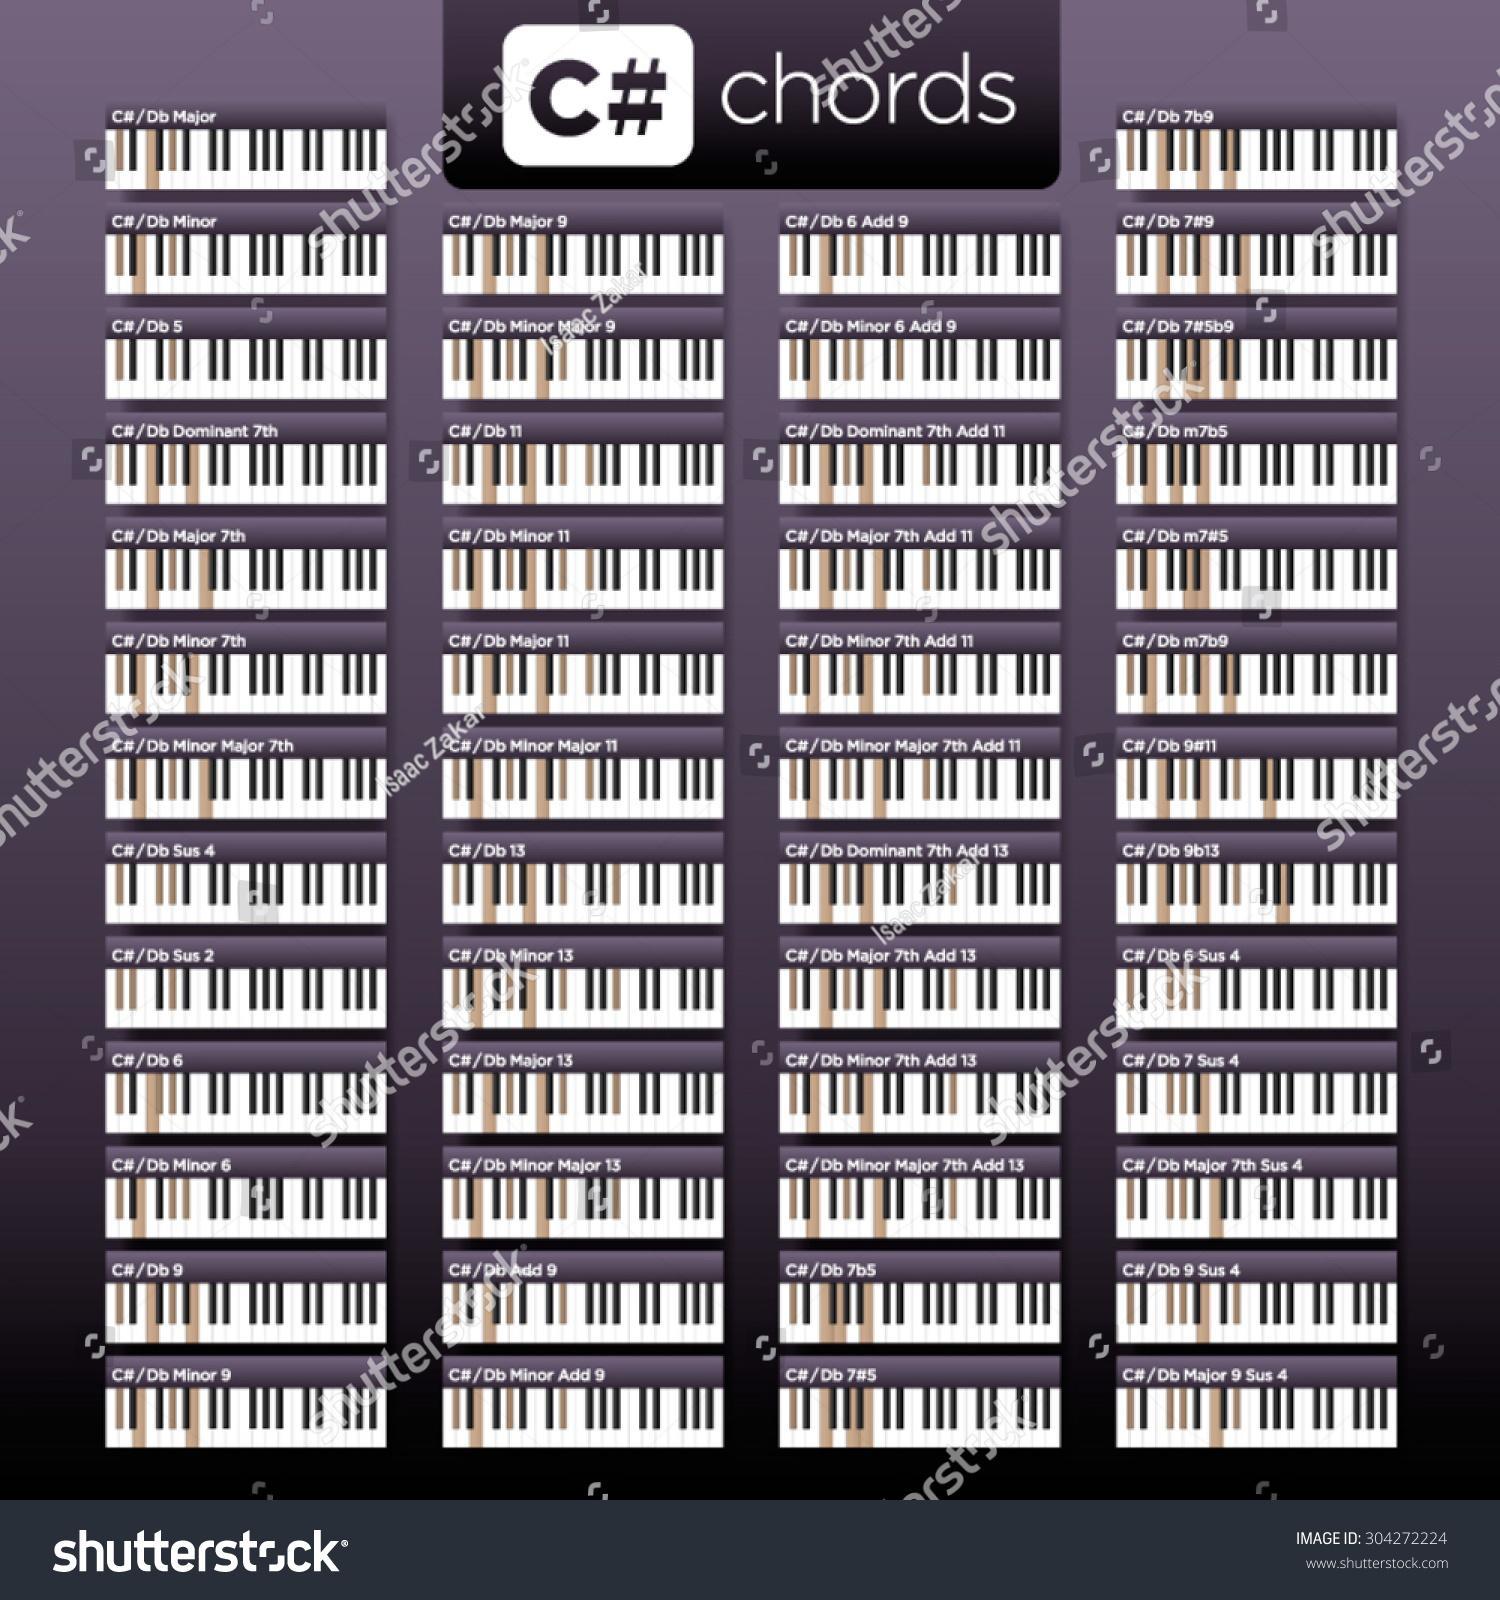 C sharp d flat piano chords stock vector 304272224 shutterstock c sharp or d flat piano chords hexwebz Gallery